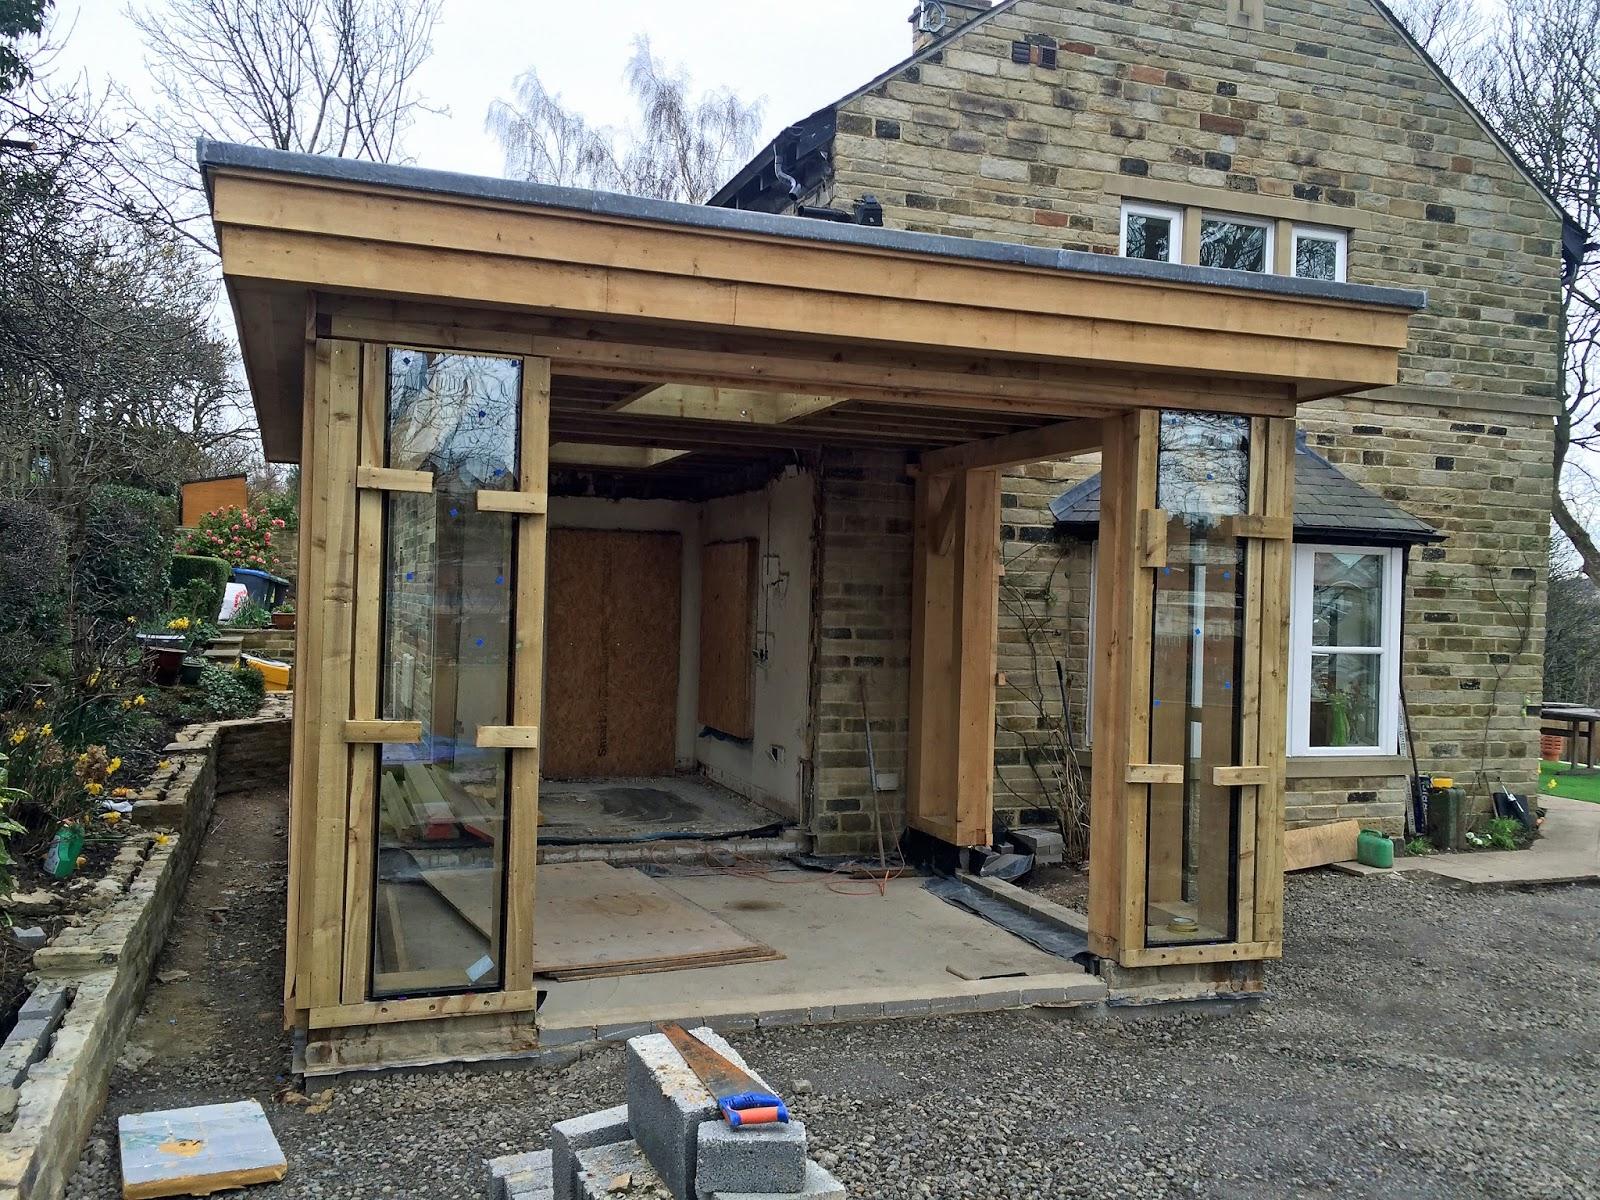 Final stages of fixed glazing in a new oak framed sunroom \u2013 Reynaers CF77 bi fold doors being installed soon. & Marlin Windows: Reynaers CF77 bi fold doors